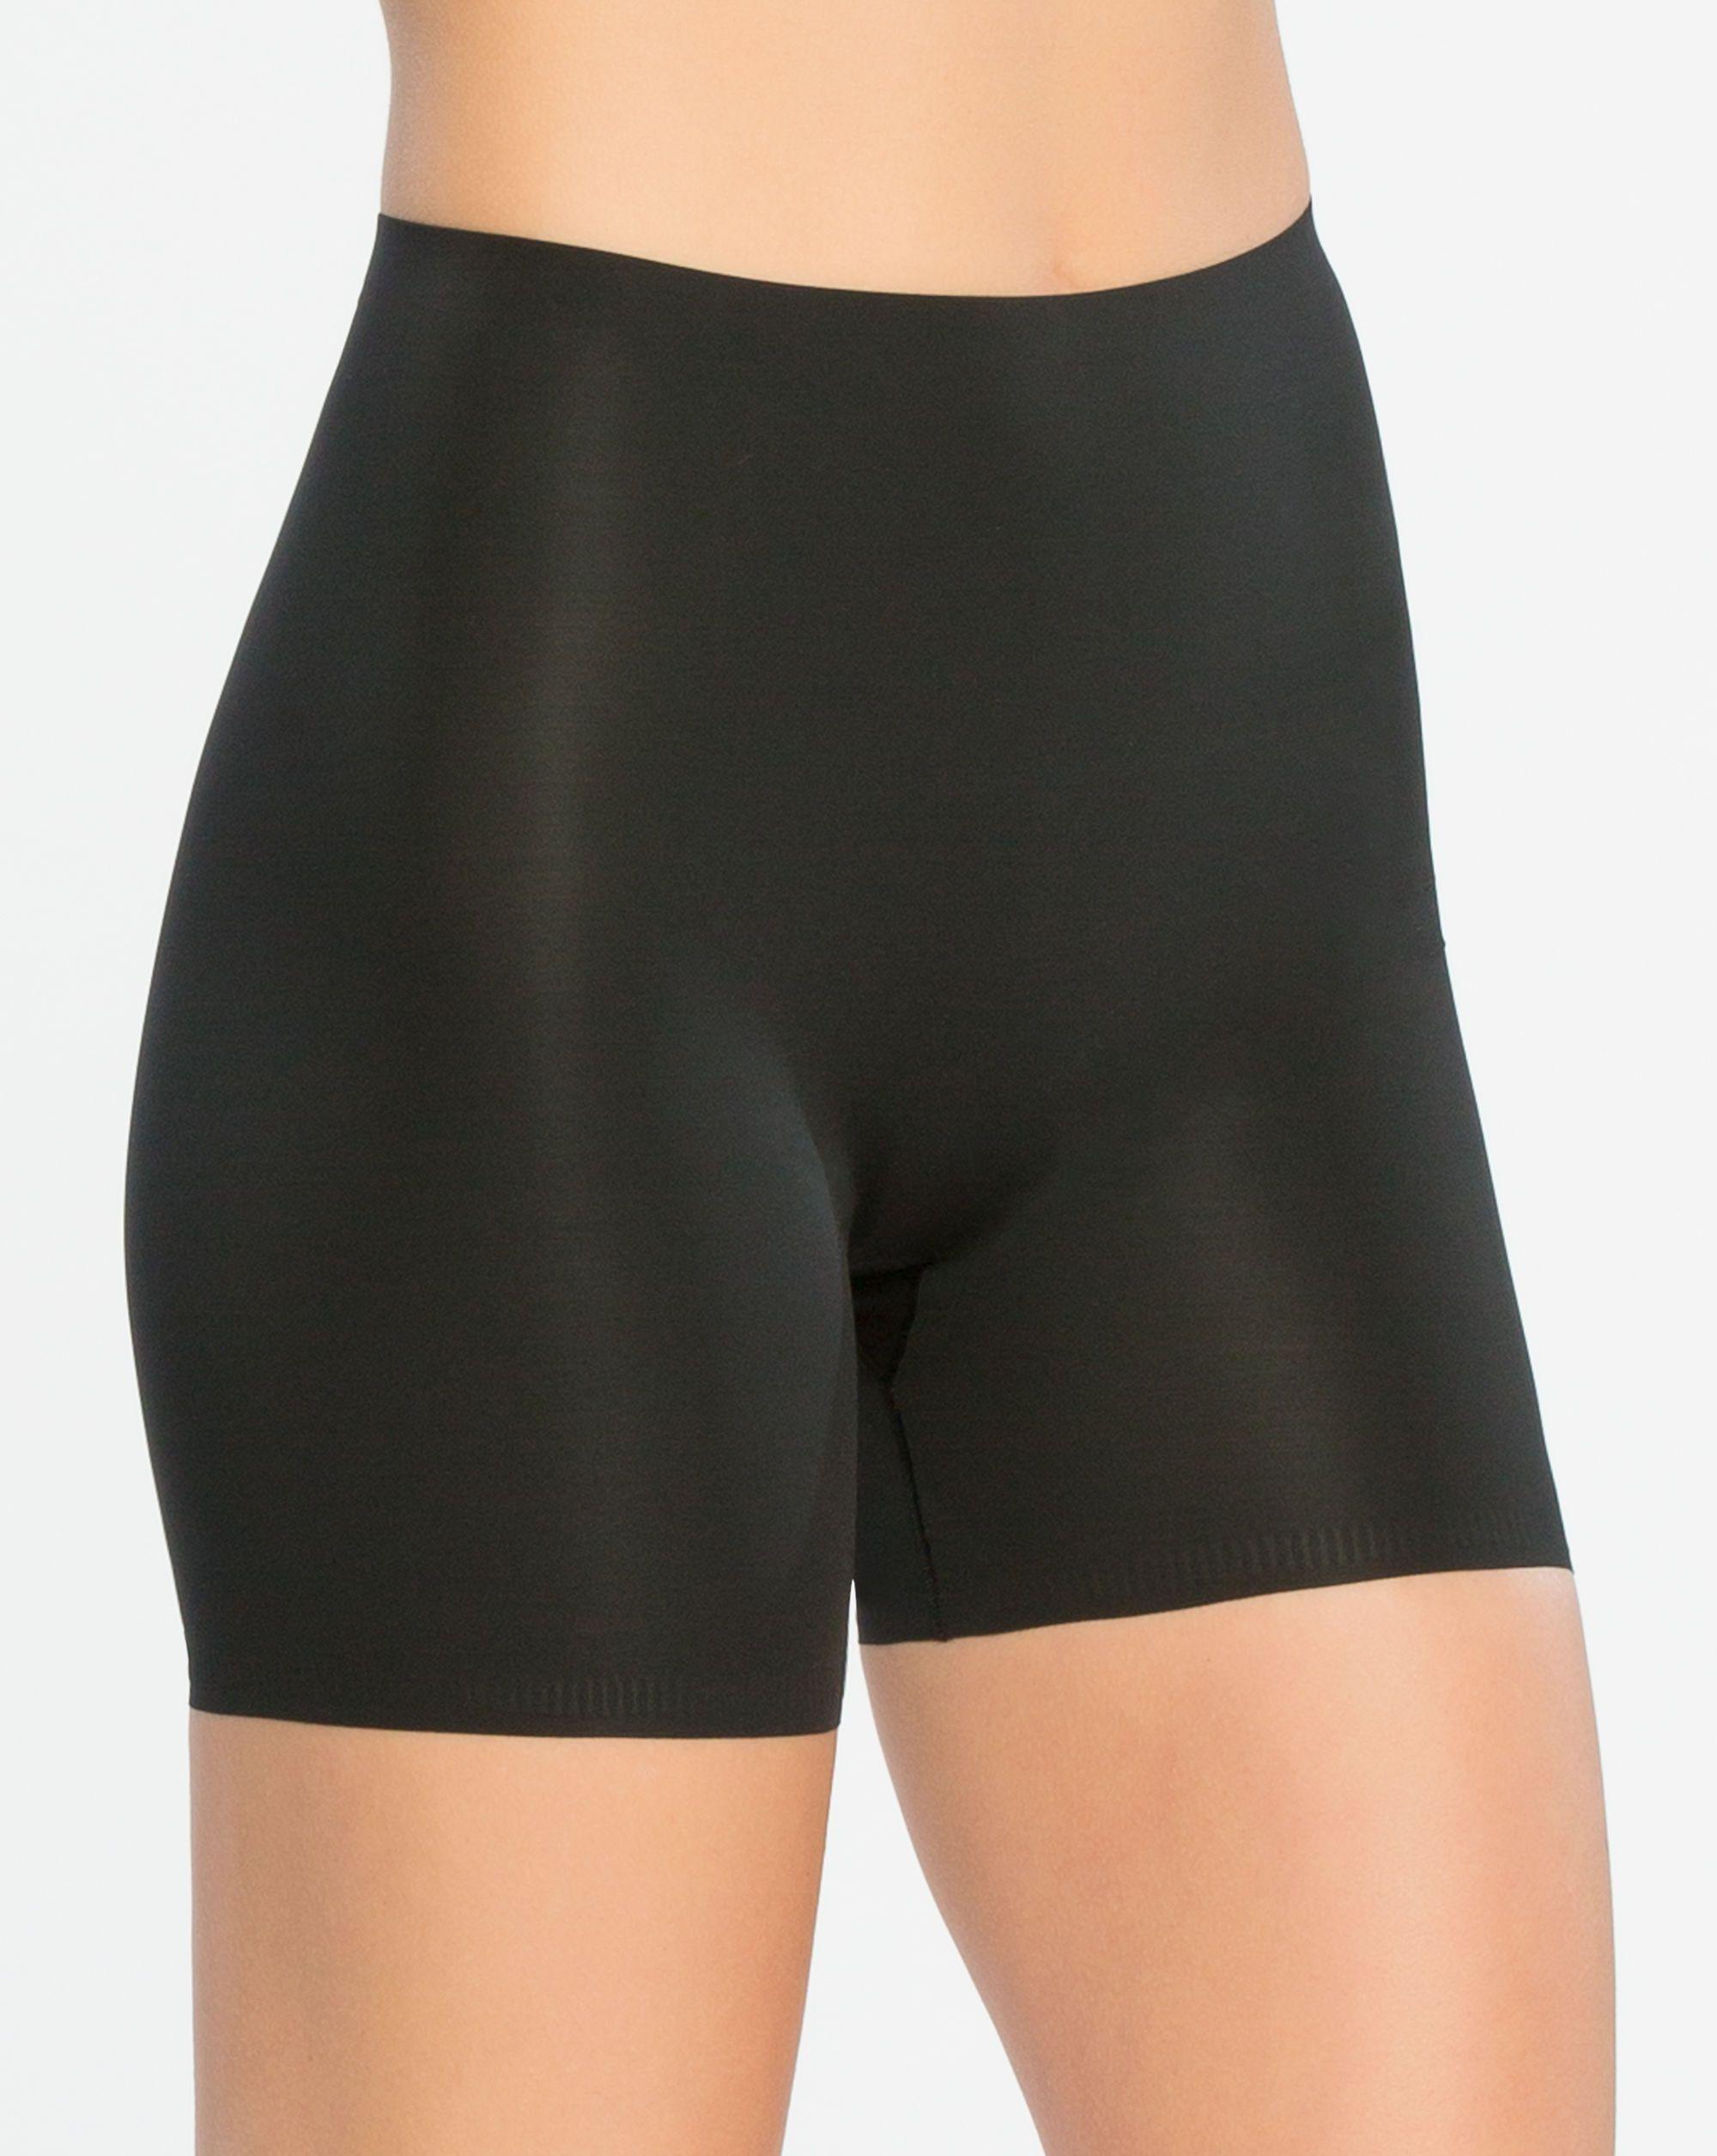 Thinstincts Girl Short In 2020 Spanx Short Girls Women